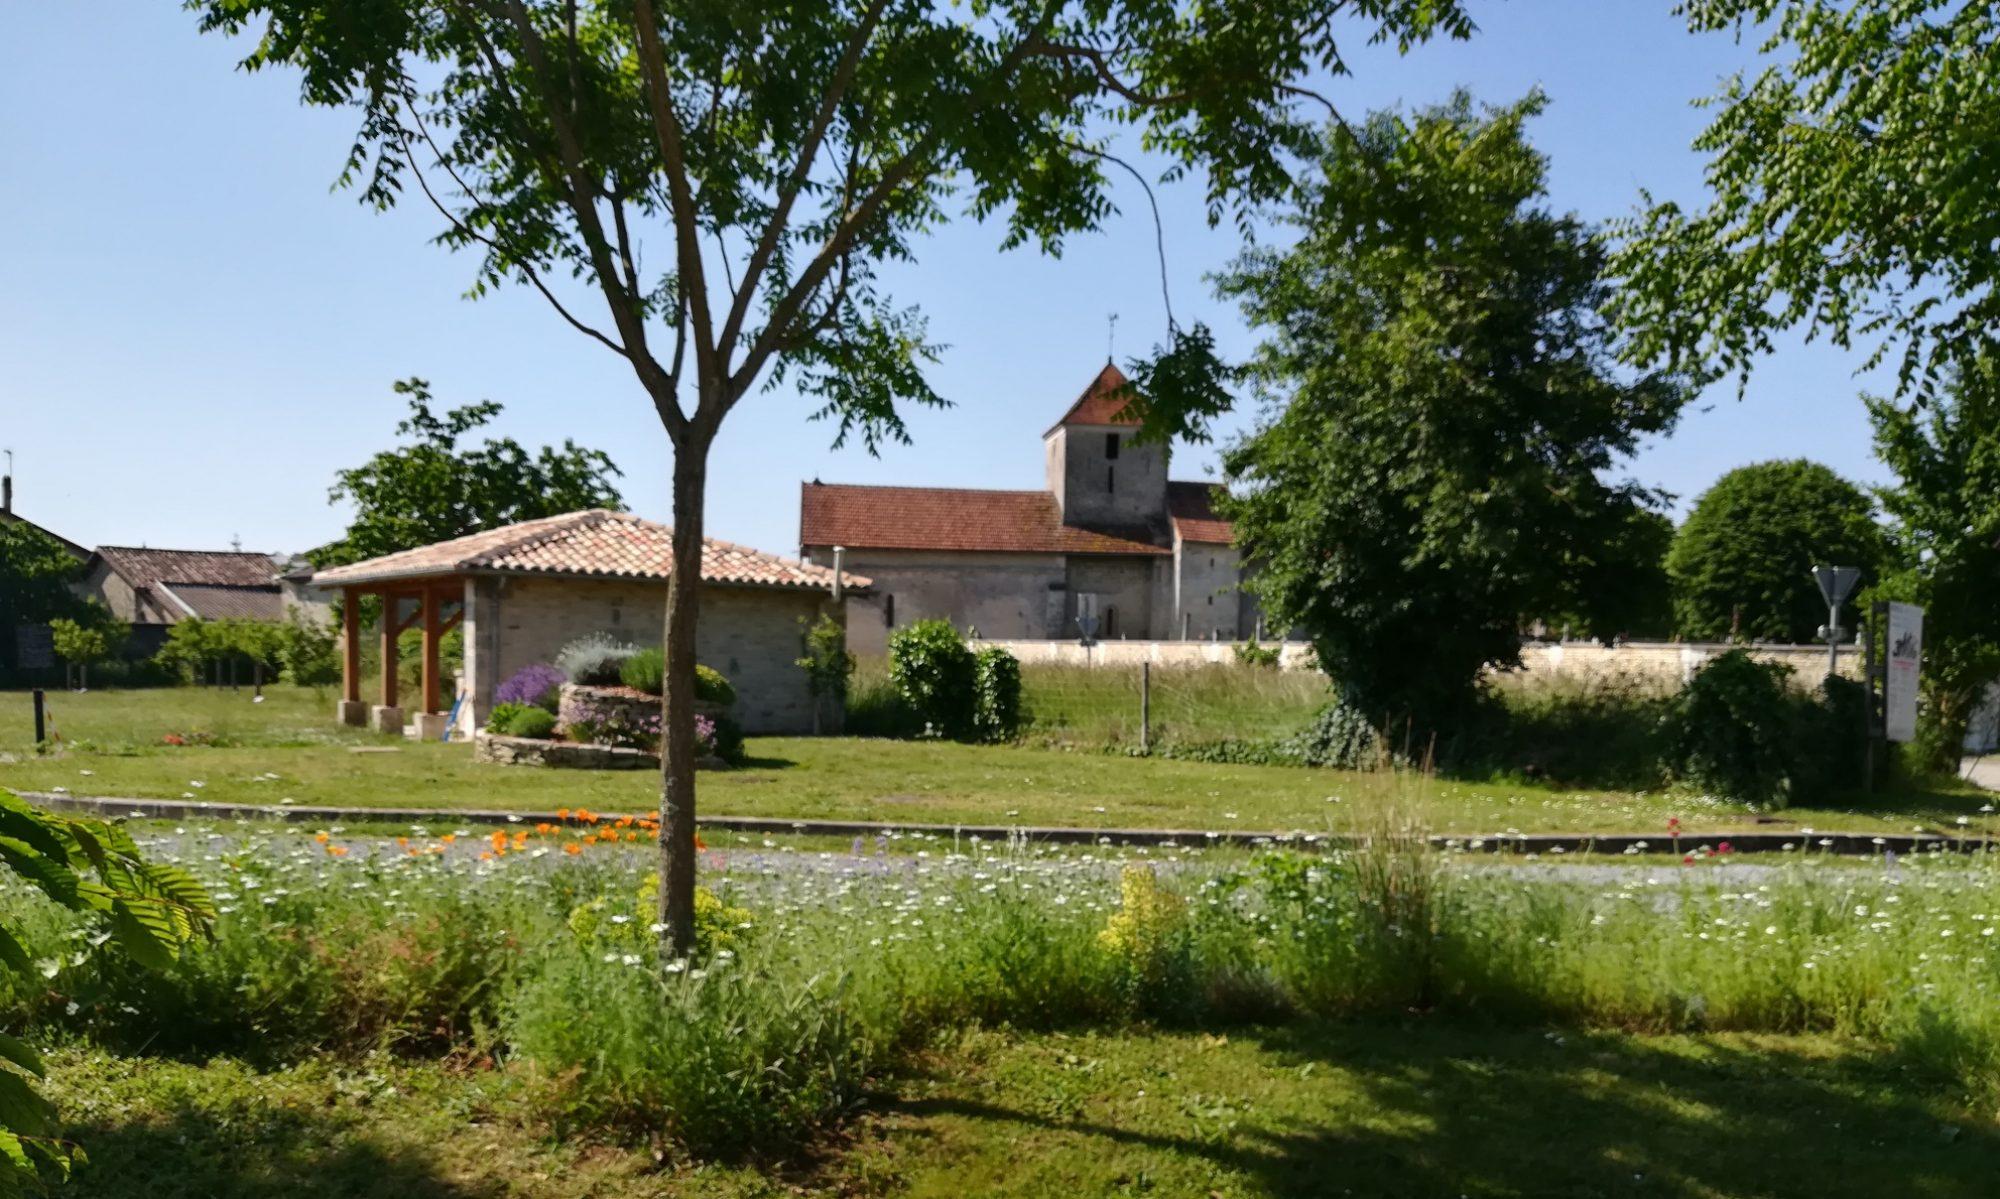 Commune de La Faye - Charente 16700